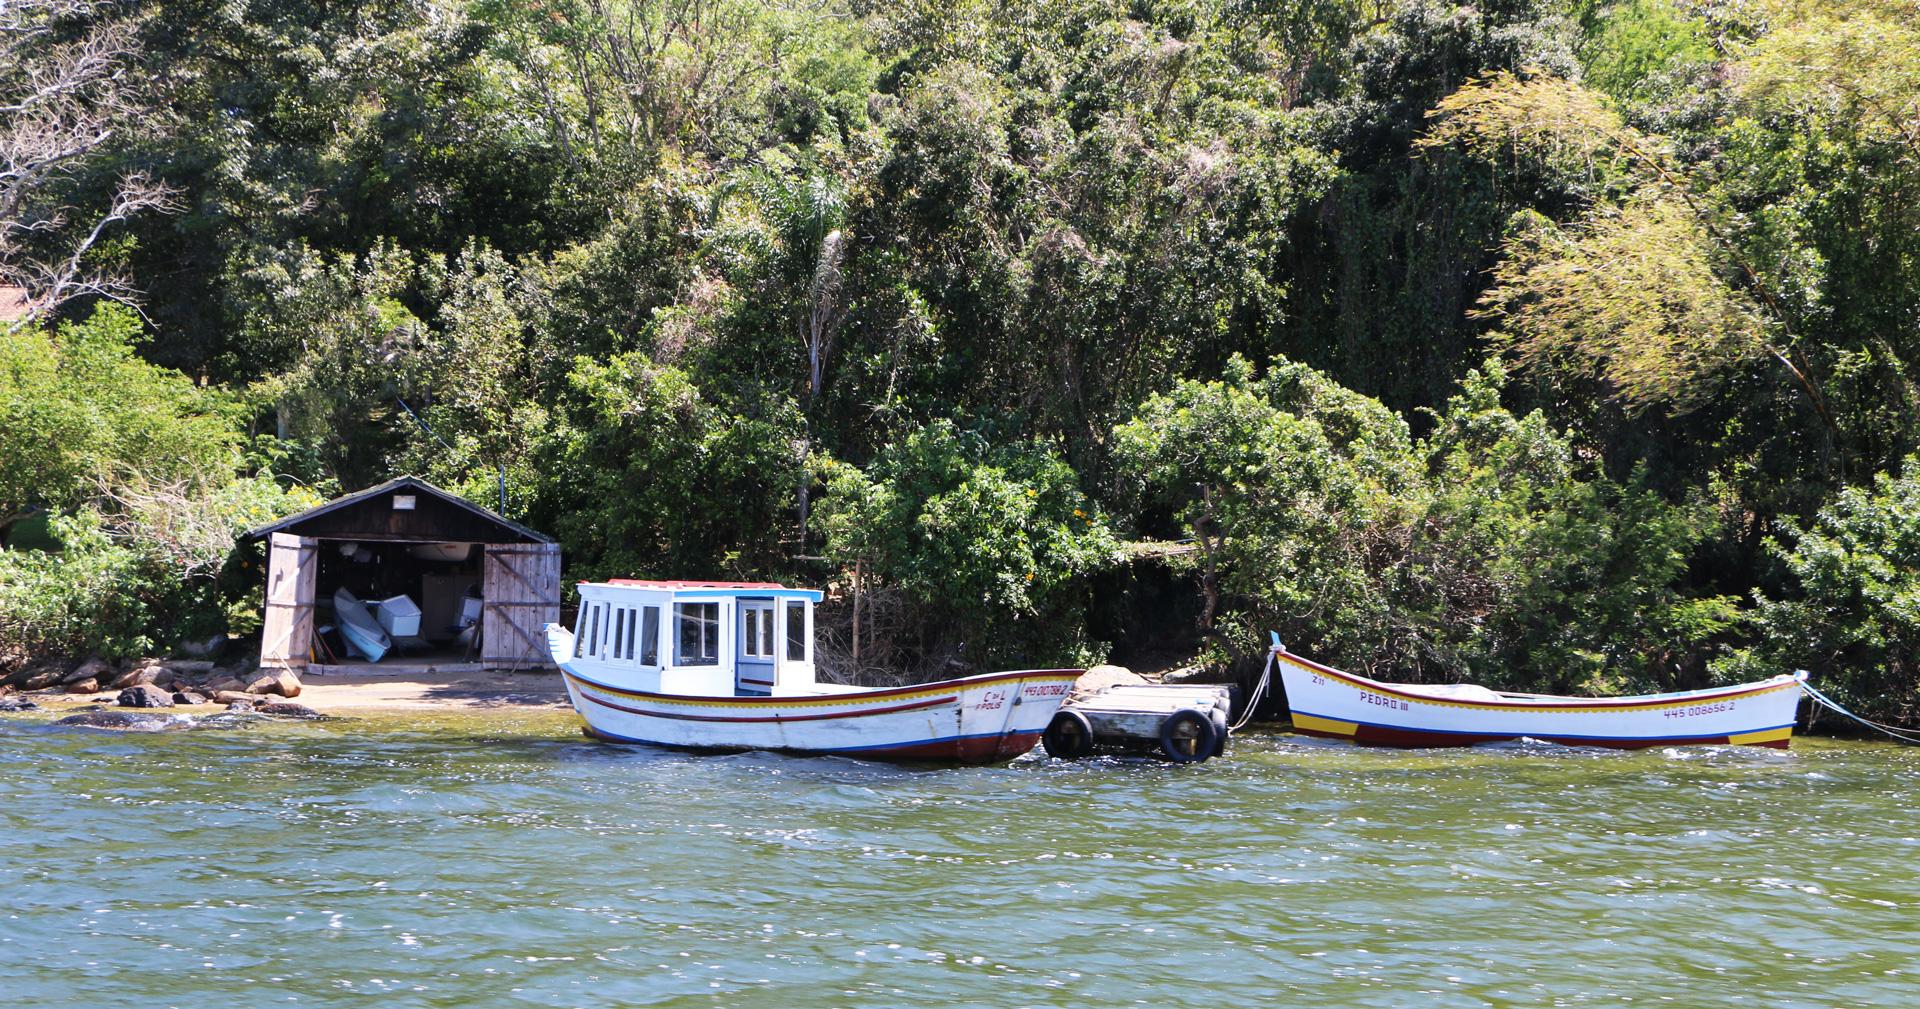 boats-lagao-florianopolis